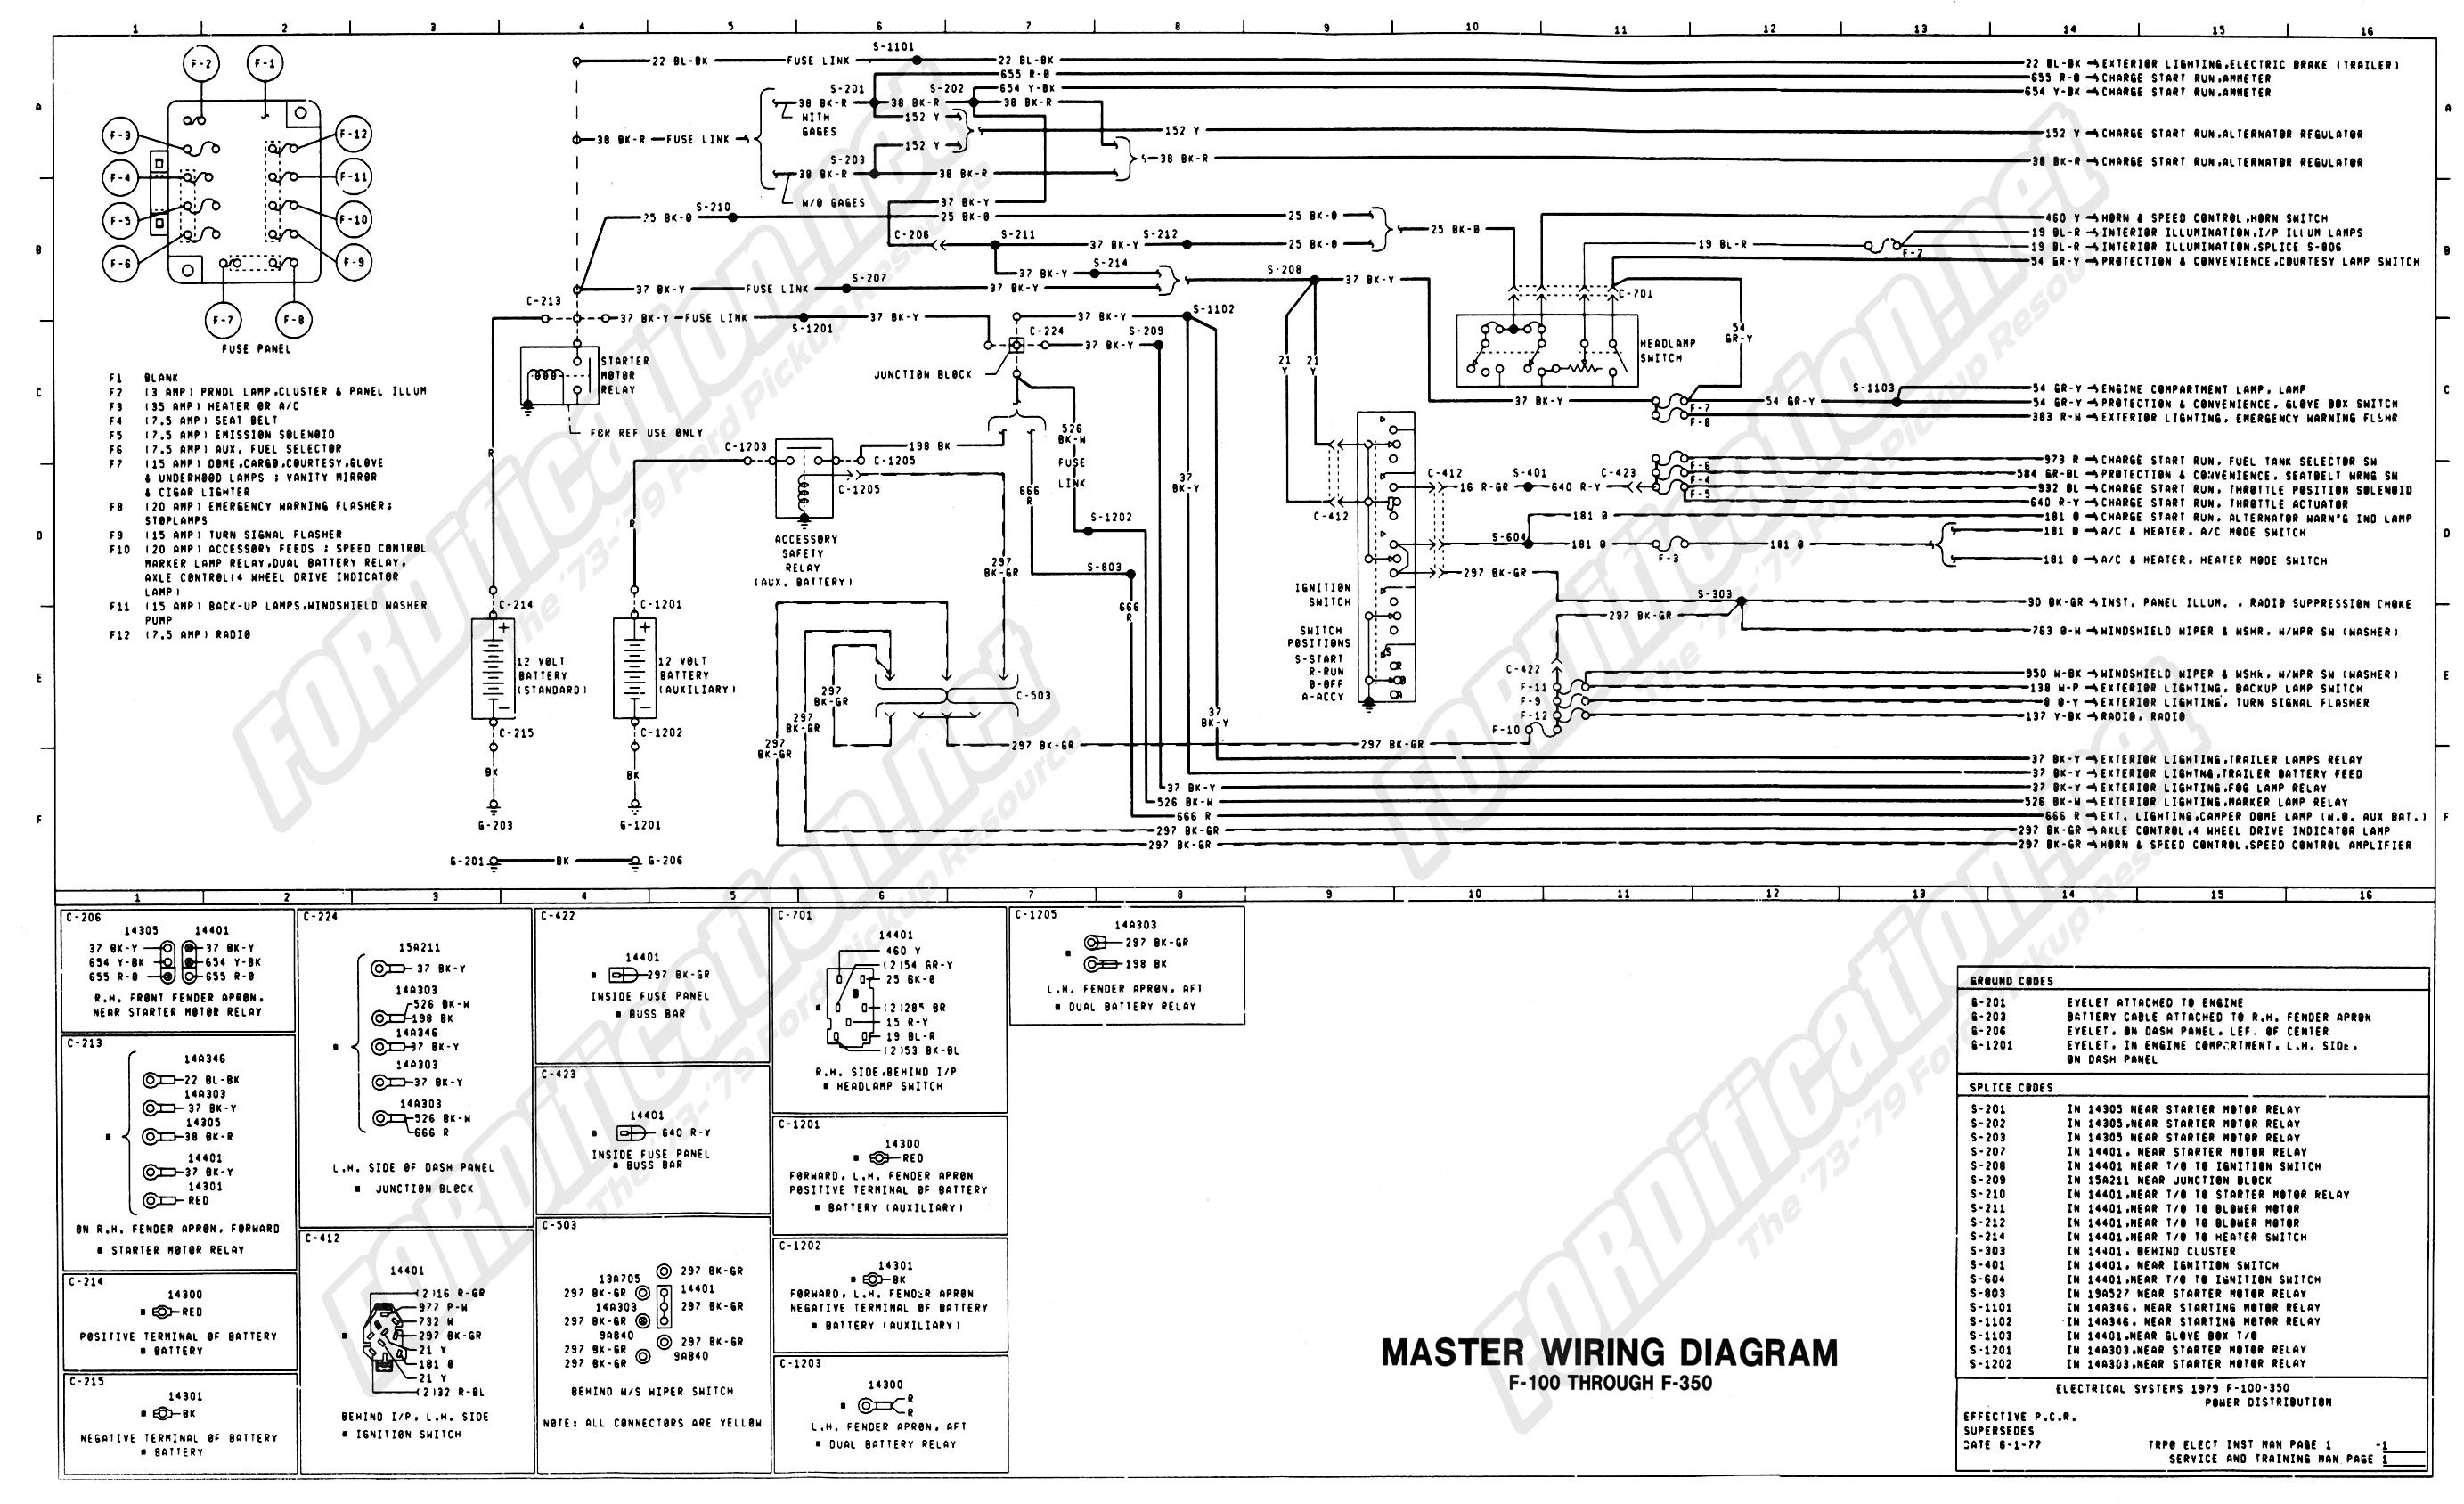 87 Chevy Truck Wiring Diagram Wiring 79master 1of9 for 79 Chevy Truck Diagram Wiring Diagram Of 87 Chevy Truck Wiring Diagram